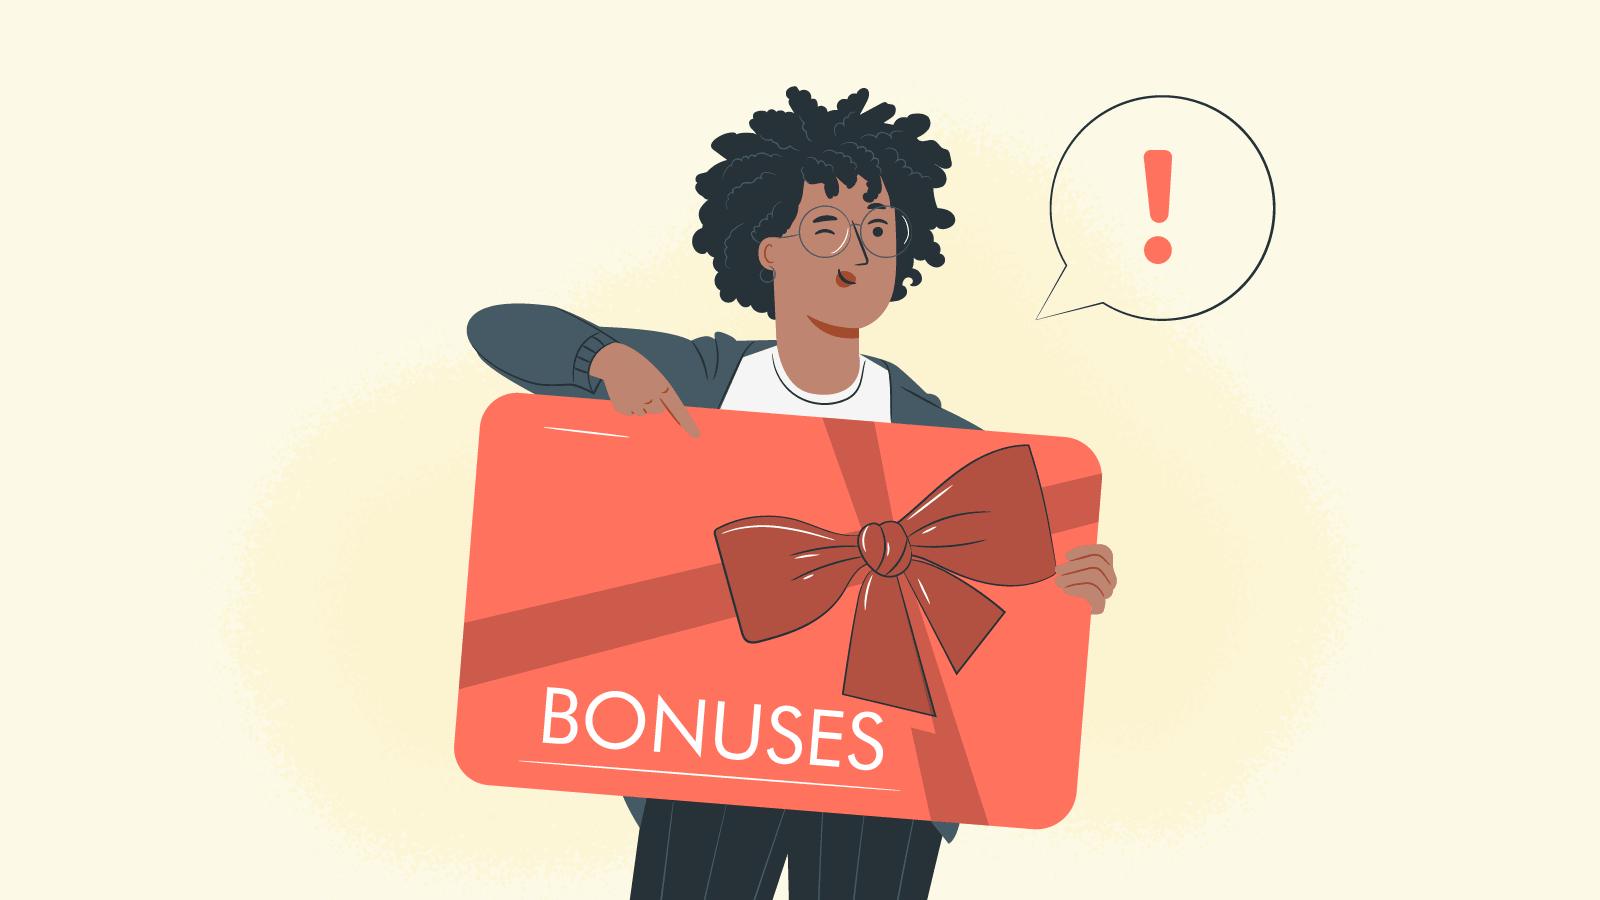 Look at the bonus type